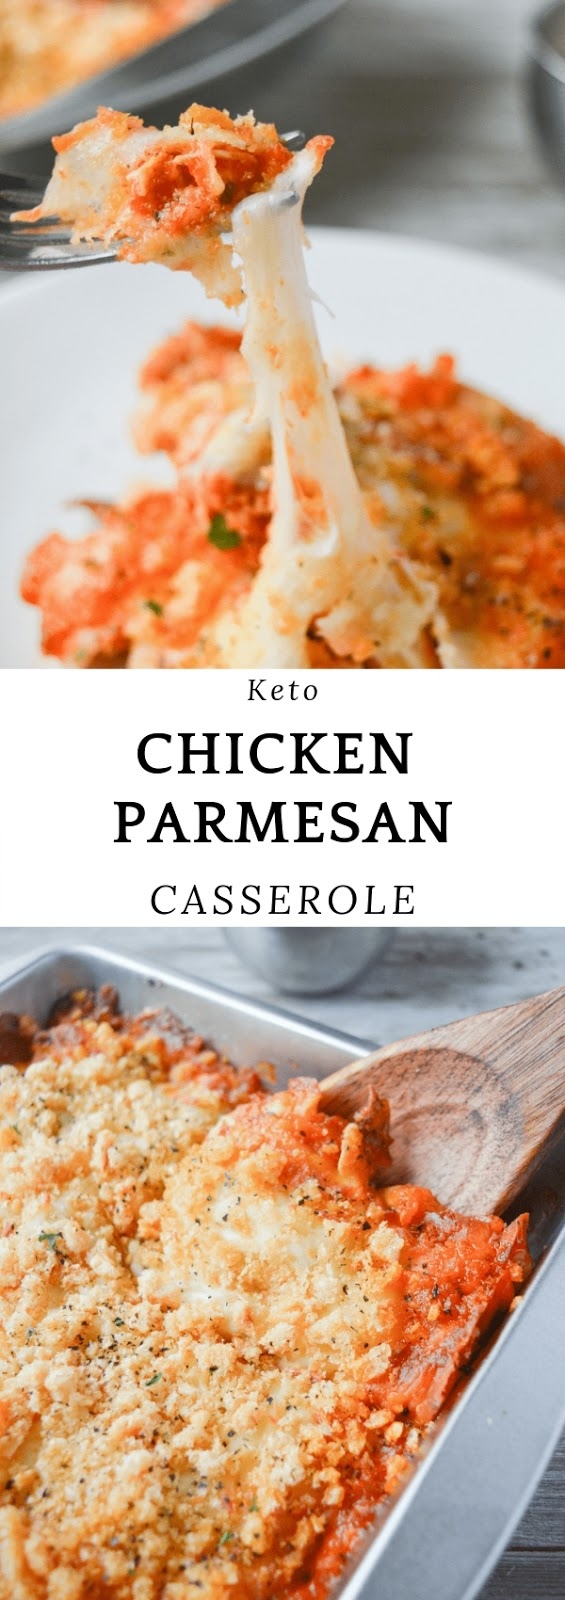 KETO CHICKEN PARMESAN CASSEROLE #dinner #maincourse #keto #chicken #parmesan #casserole